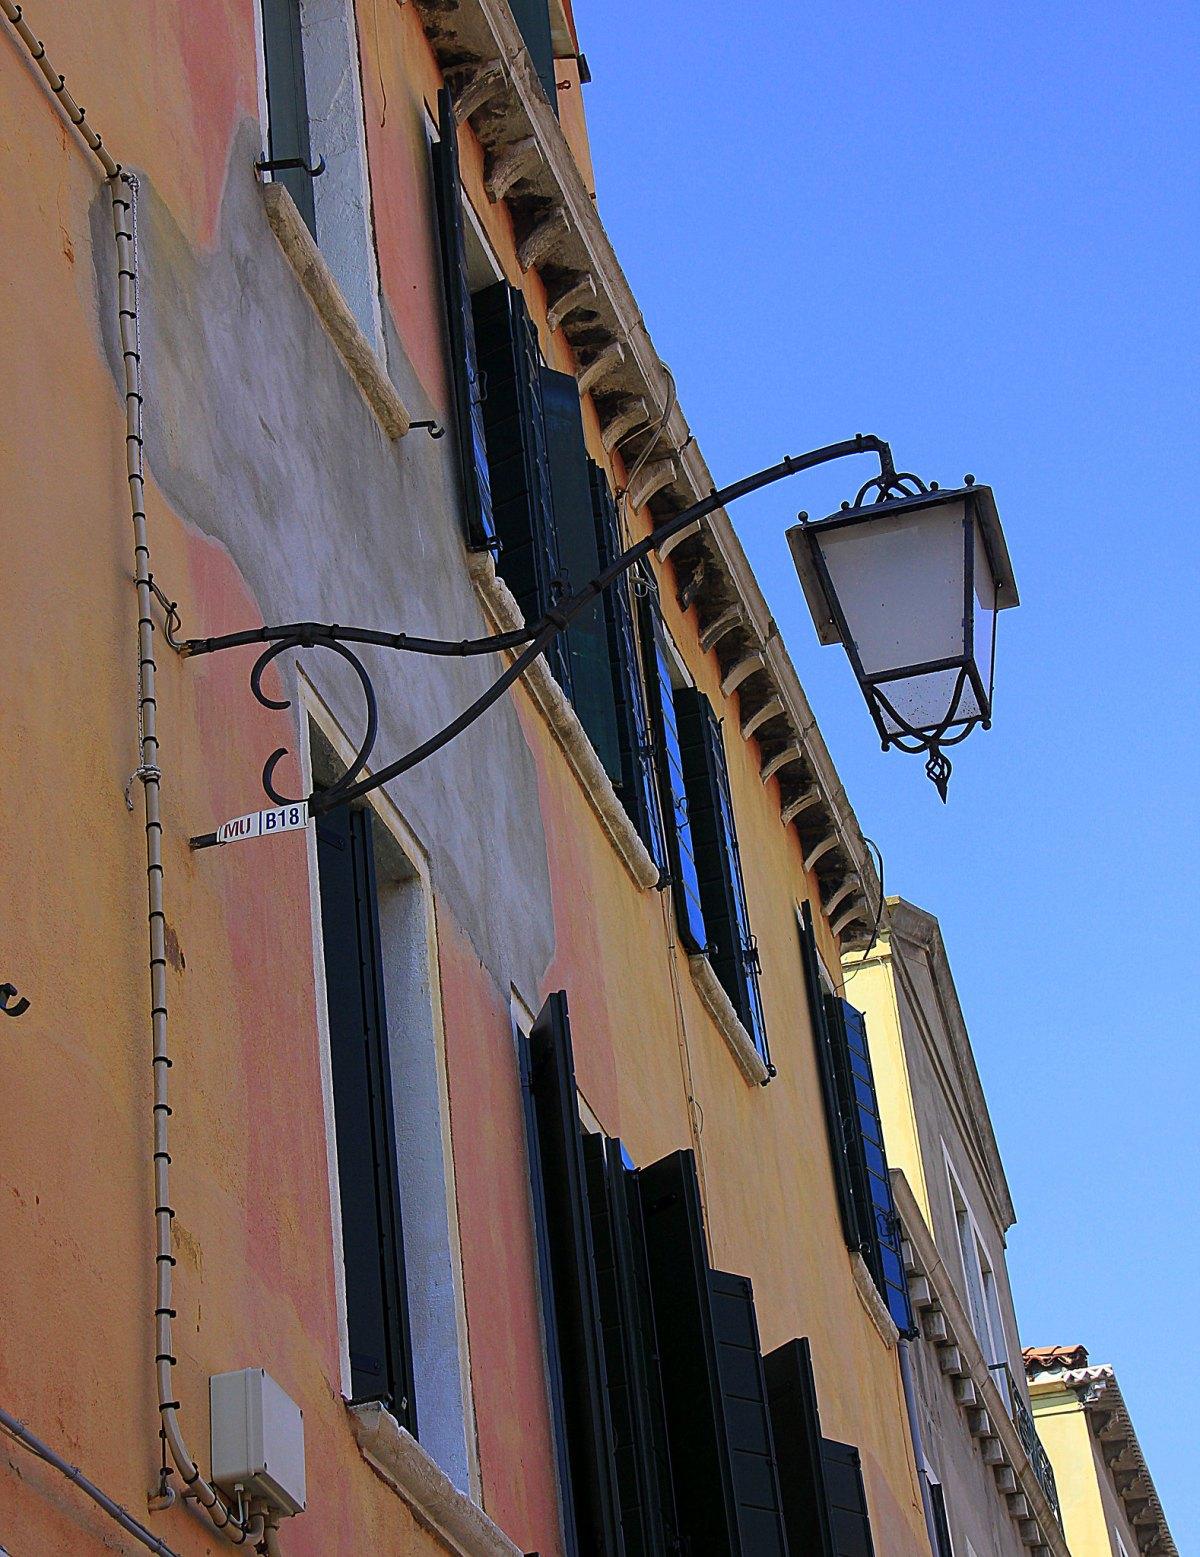 Murano is very pretty